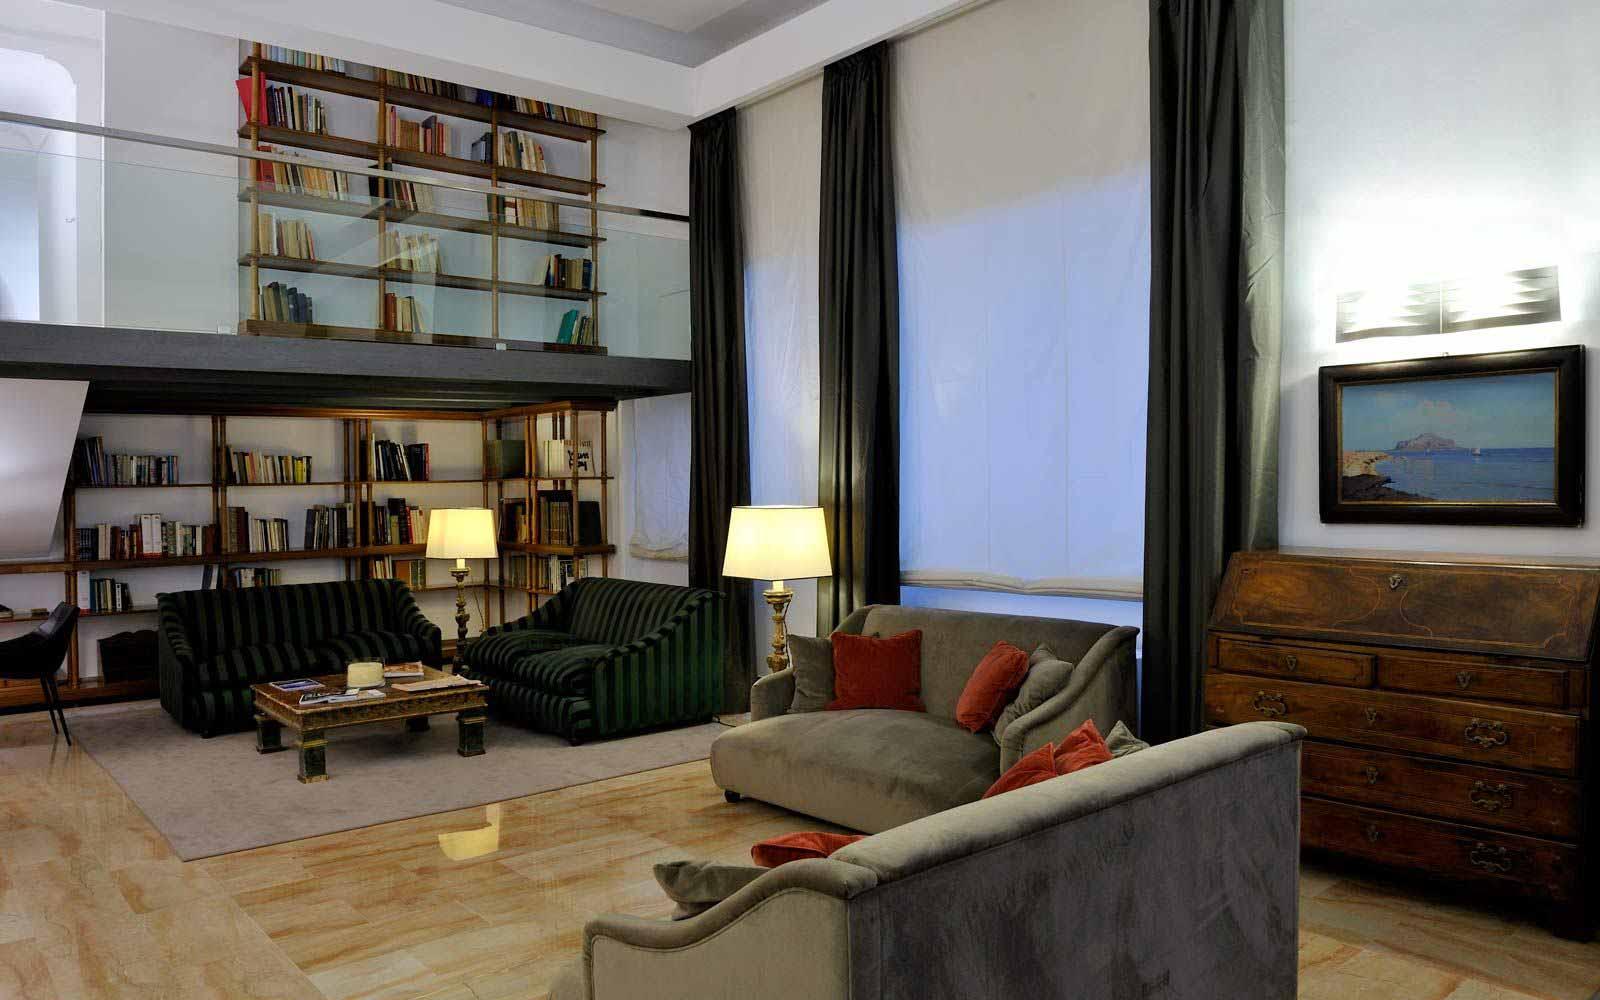 Library at Hotel Principe Di Villafranca